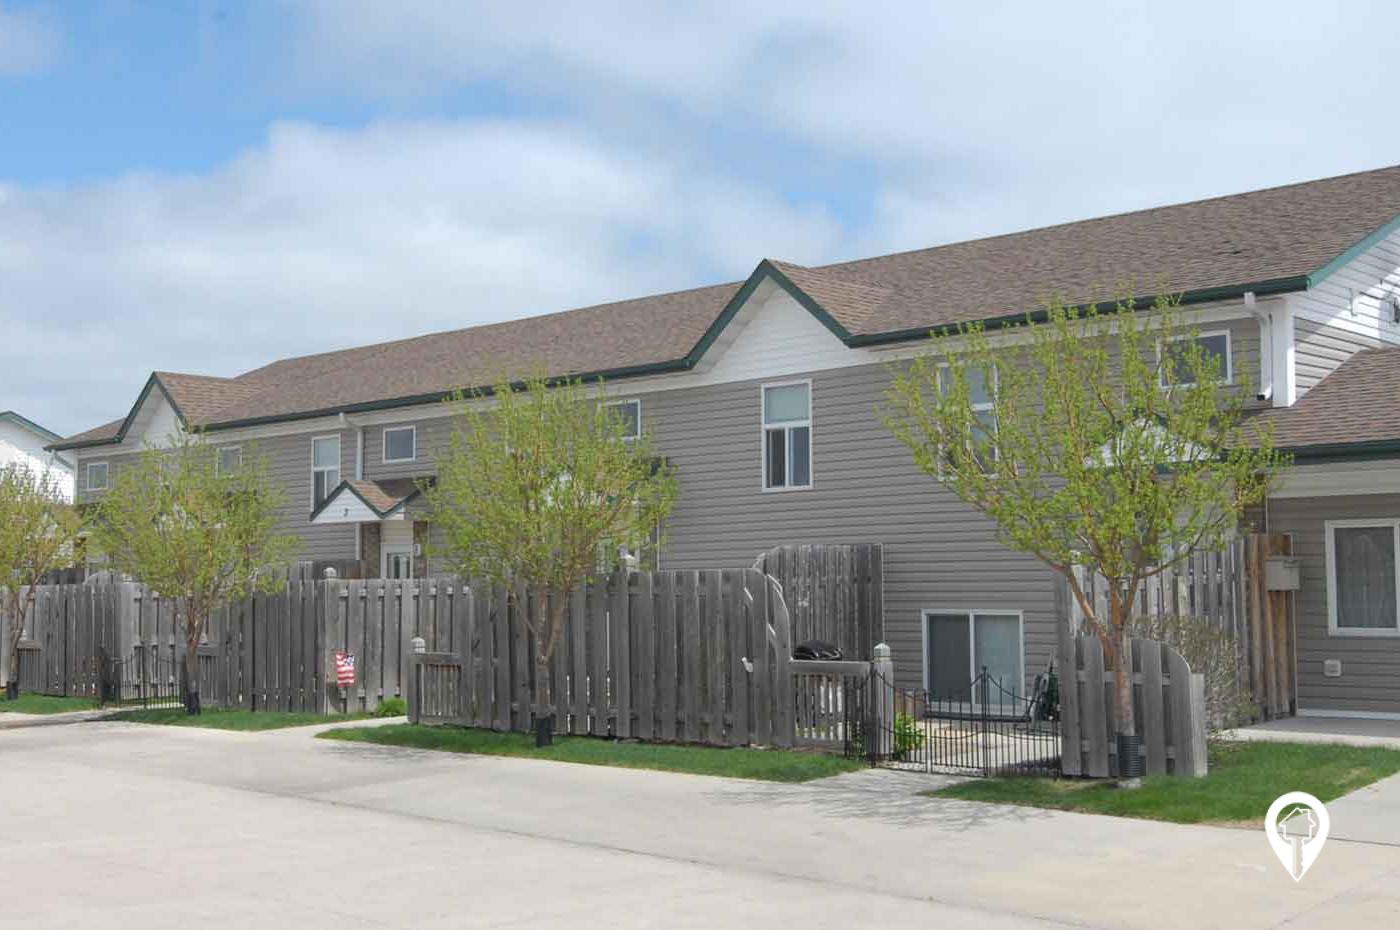 Fargo Moorhead Living - WillowWood Greens Townhomes